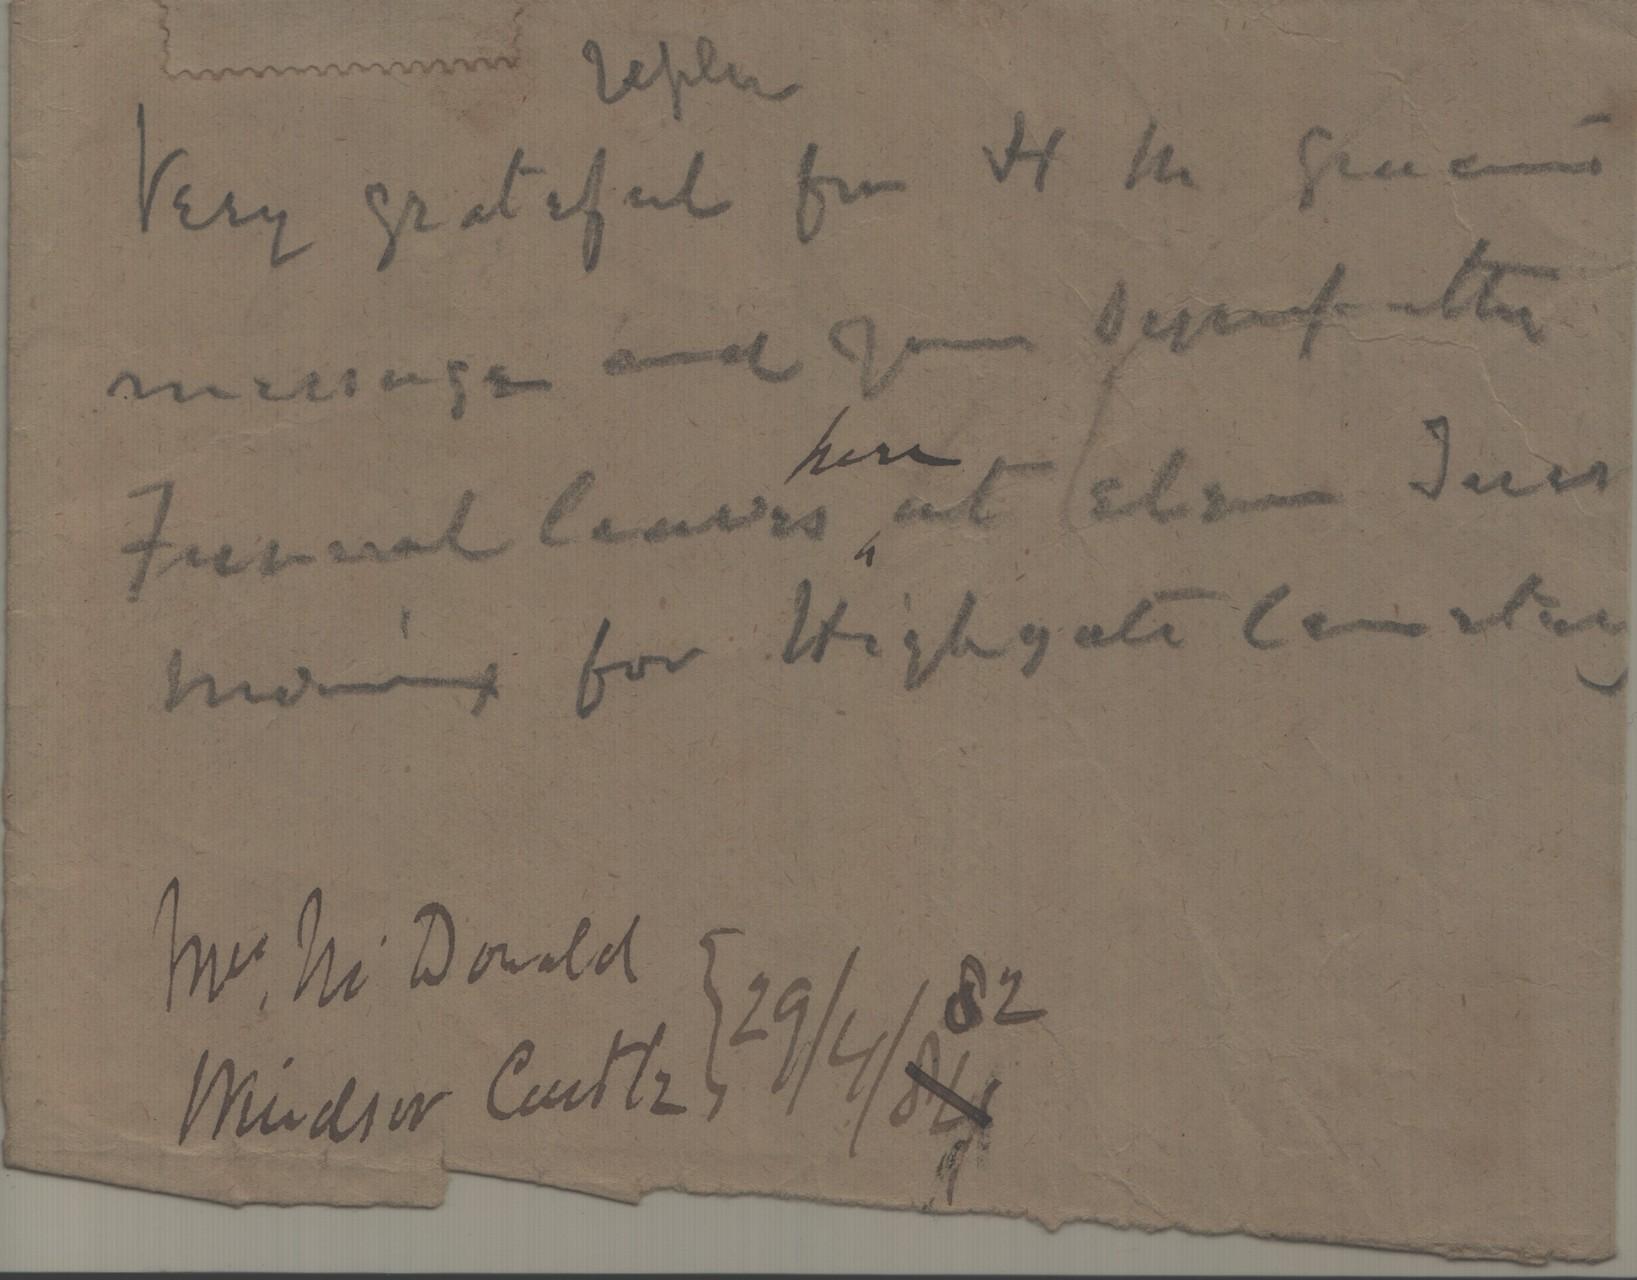 1882 April 29th JHL to Queen via AMcD